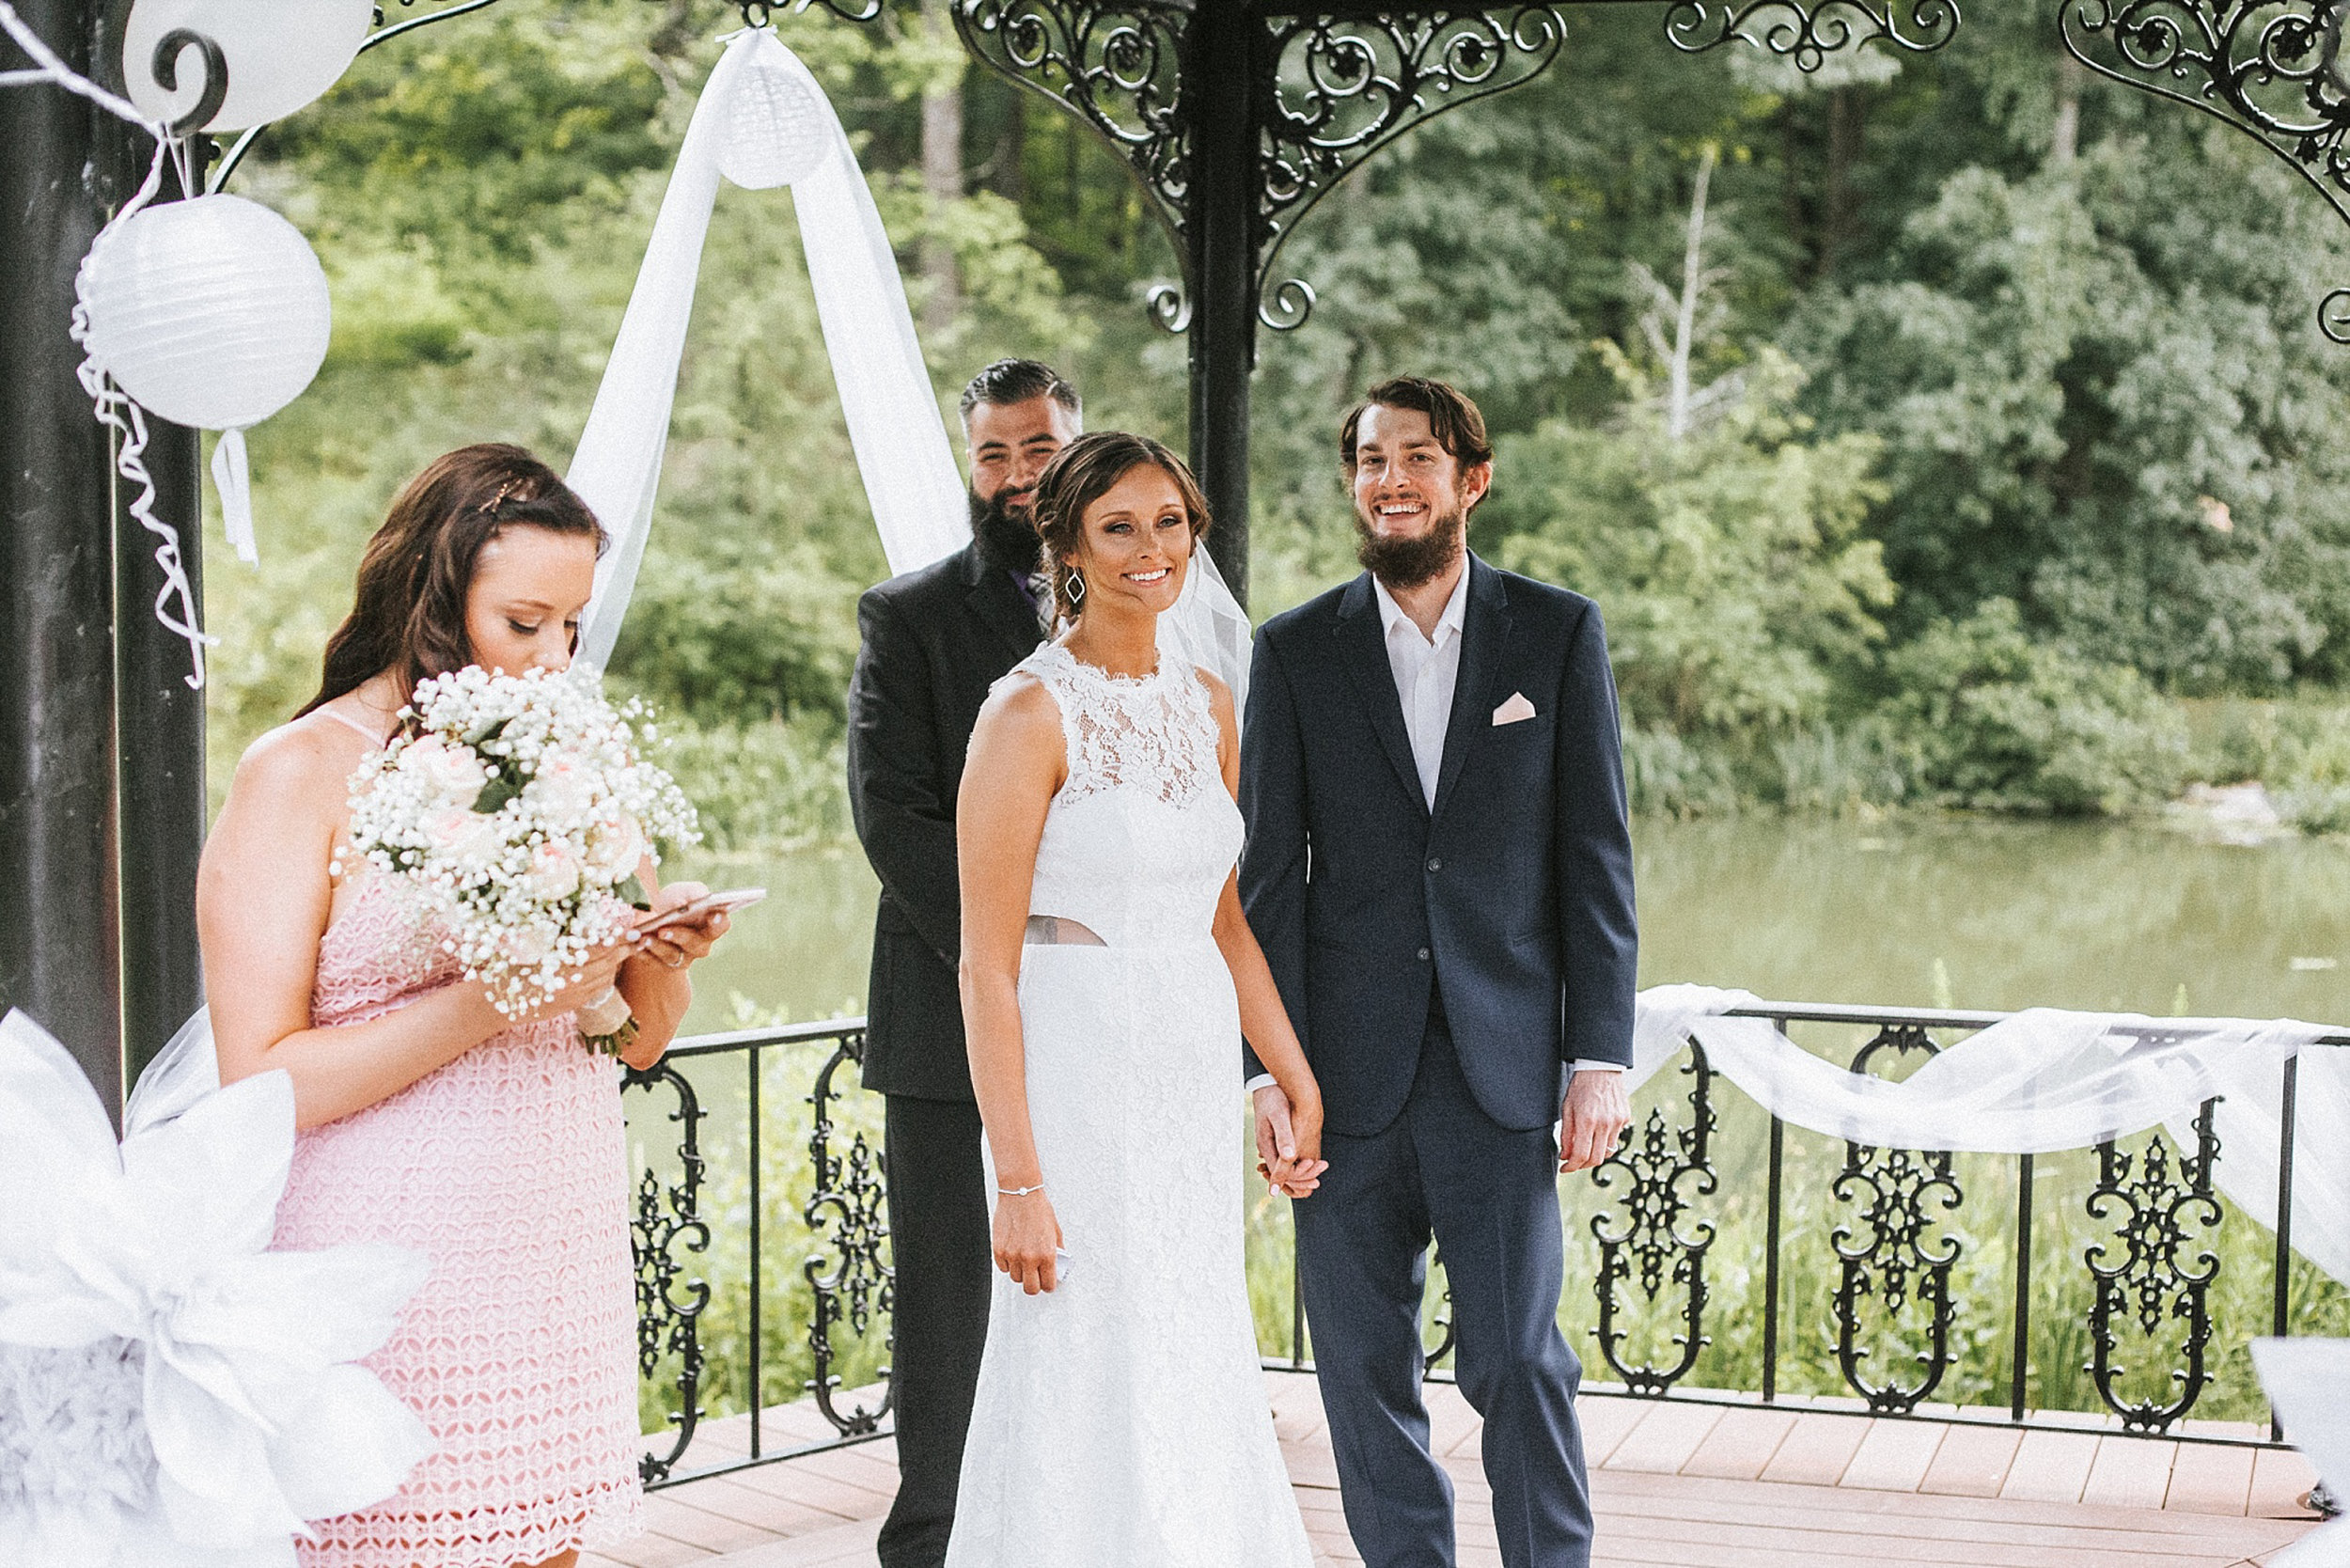 Brooke Townsend Photography - Ohio Wedding Photographer (62 of 78).jpg